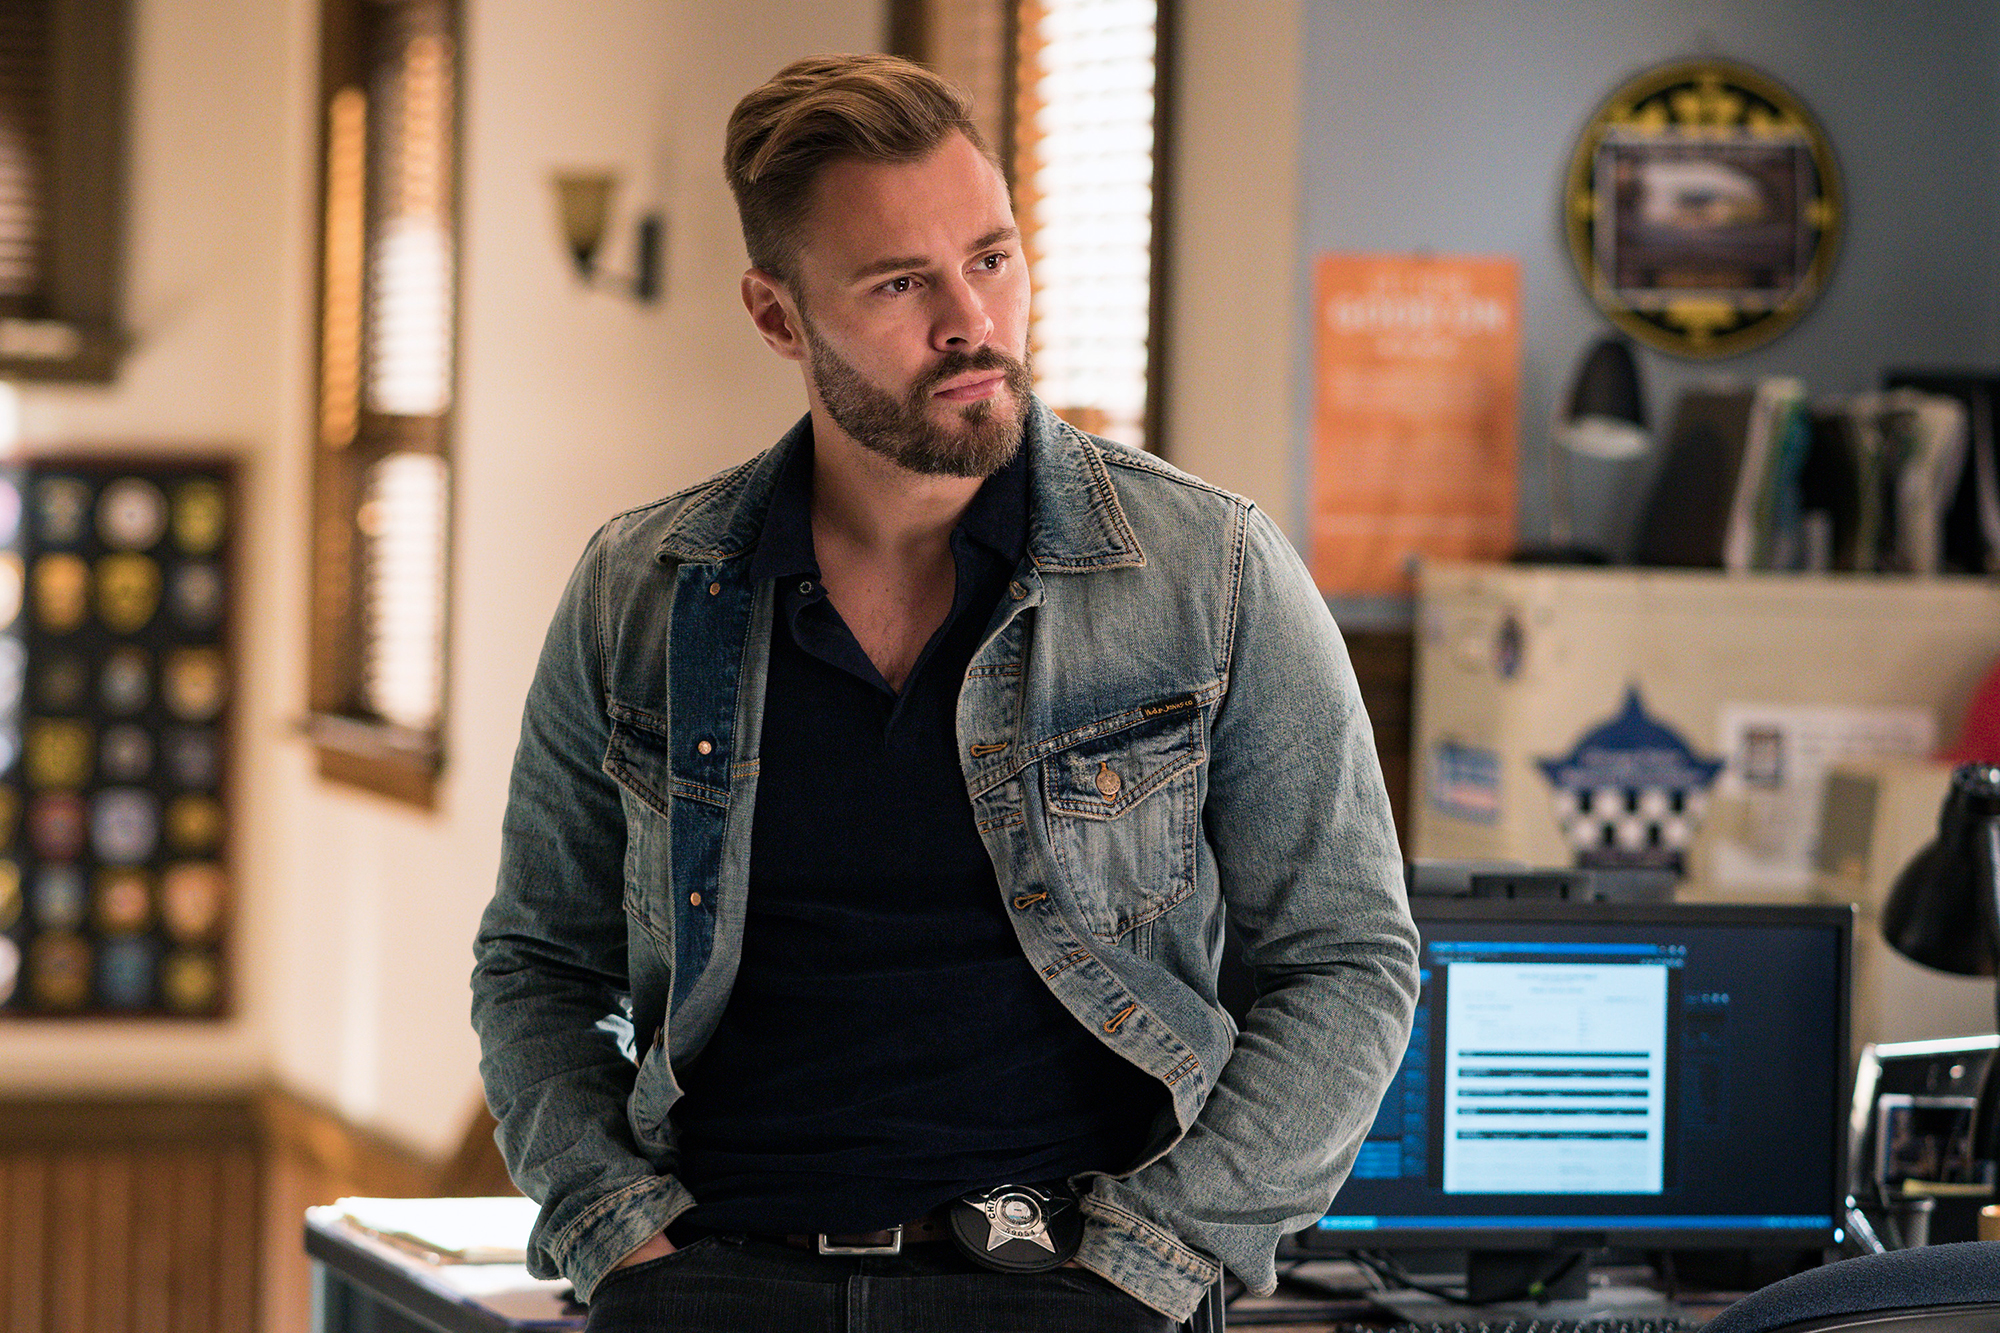 Chicago P.D.'s Patrick Flueger Worries Fans Will 'Be Pissed Off' Over Romance Twist - Patrick John Flueger as Adam Ruzek in 'Chicago P.D.'